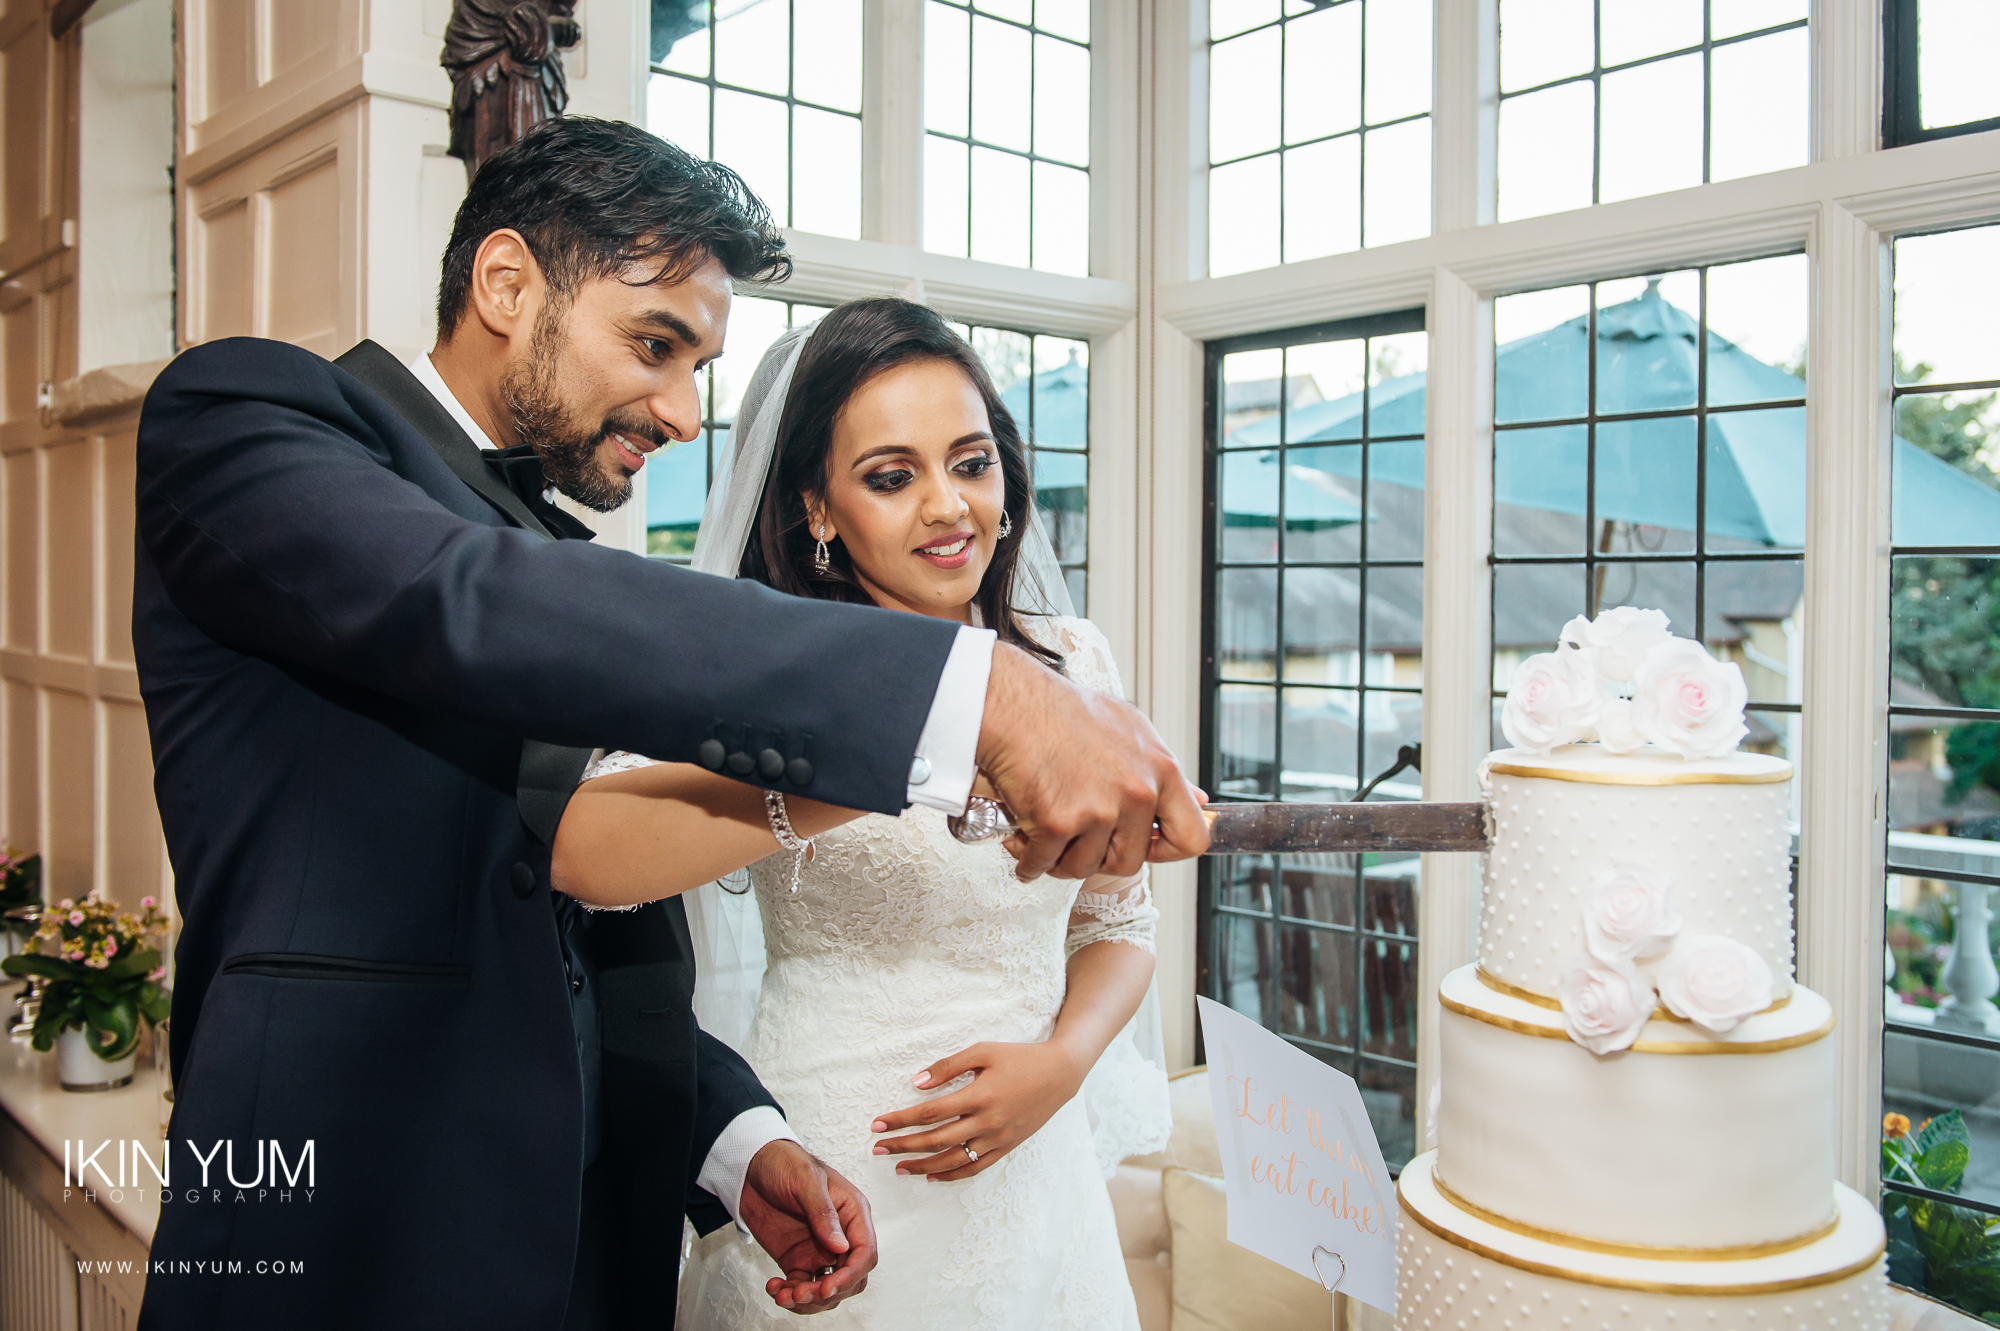 Laura Ashley Manor Wedding - Ikin Yum Photography-130.jpg